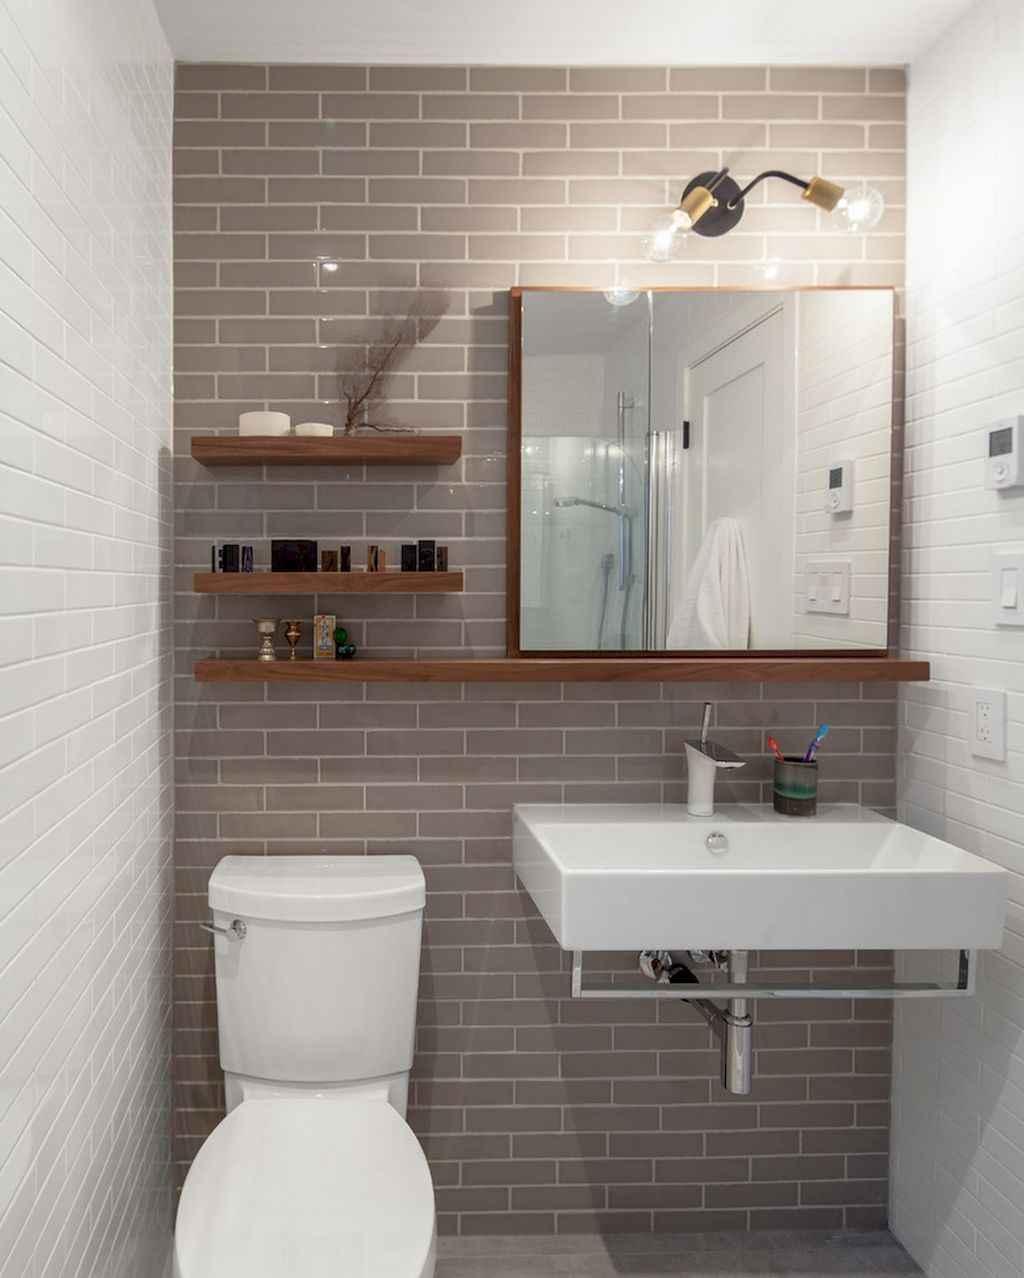 Cool bathroom storage shelves organization ideas (58)